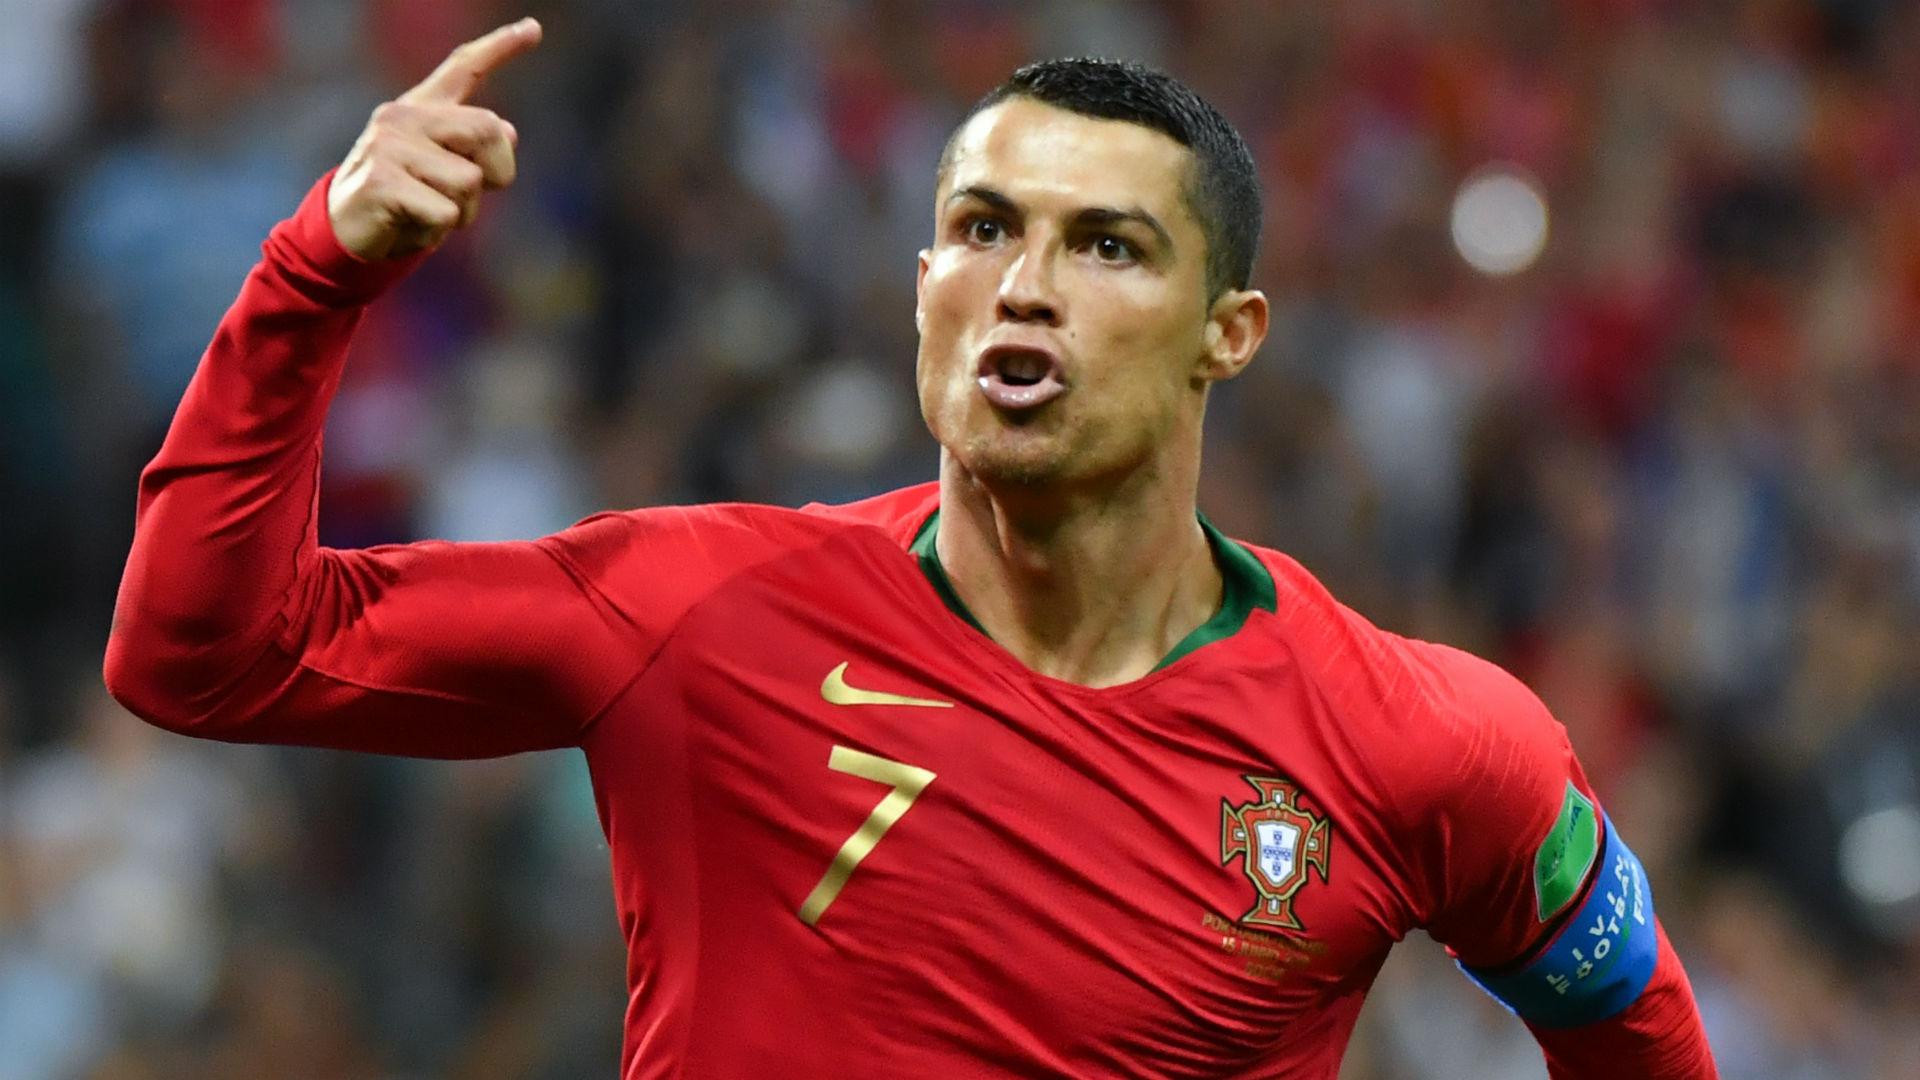 cristiano-ronaldo-portugal-spain-world-cup_1l1q8x3xk96h41kl3mrmwgyevy